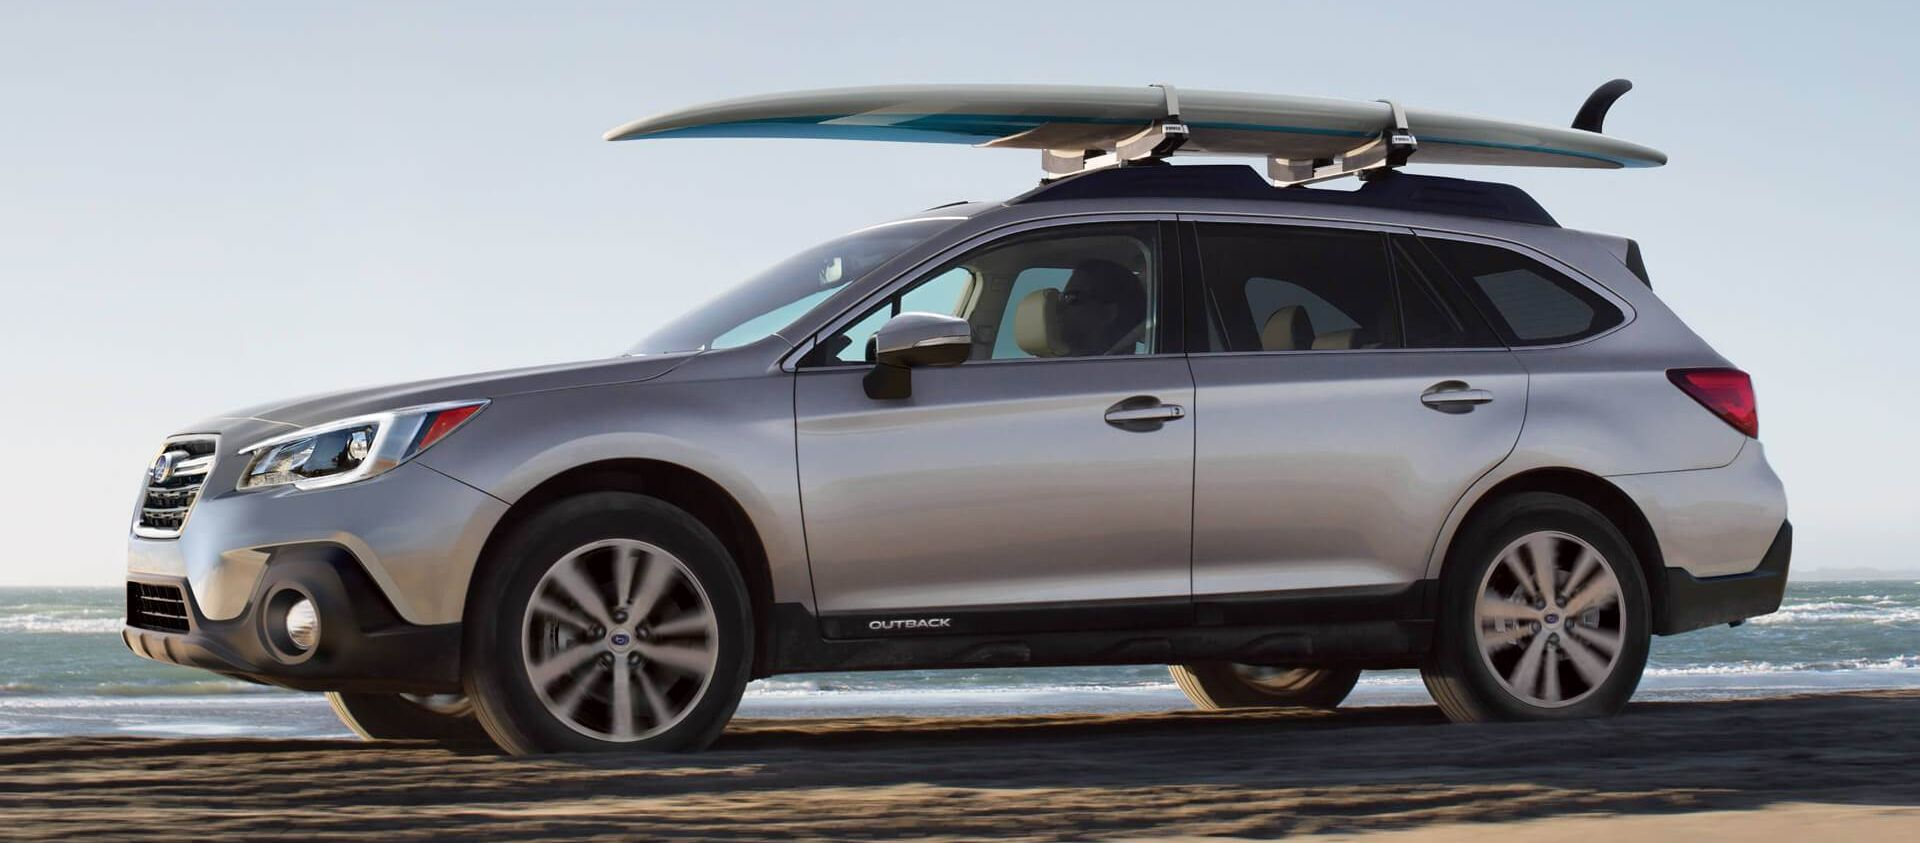 2018 Subaru Outback Financing in Sacramento, CA